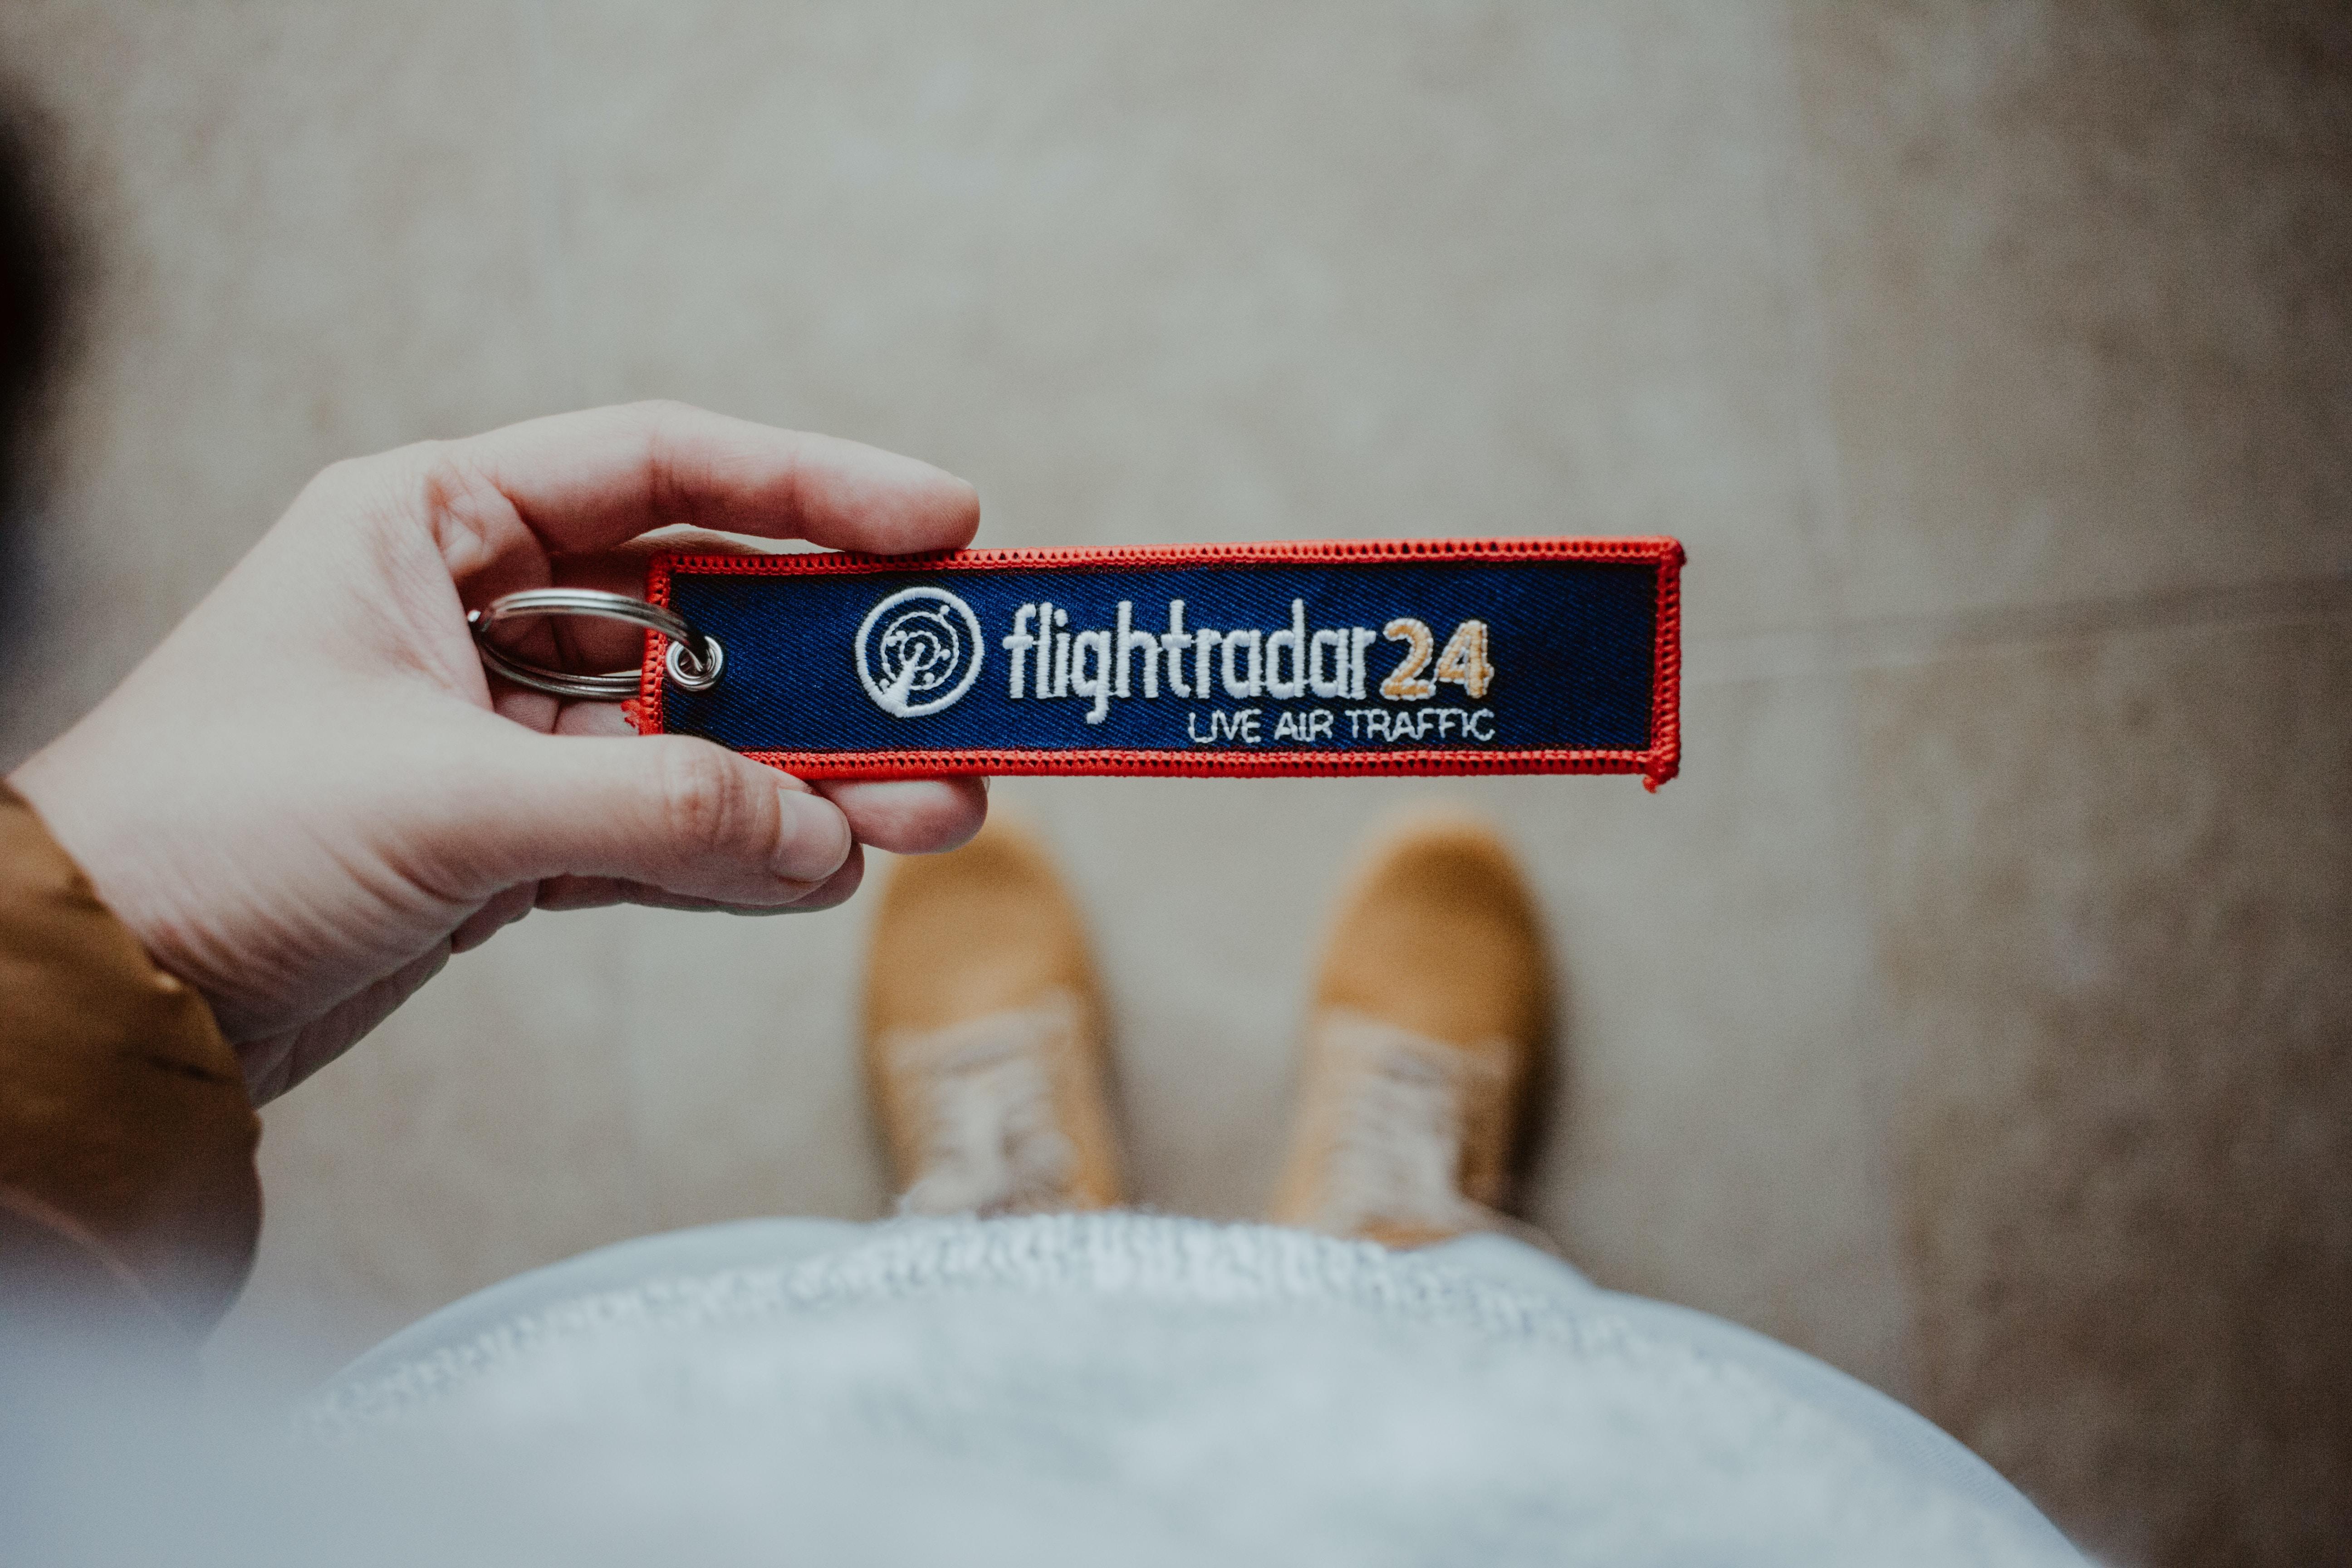 person holding Flightradar 24 card